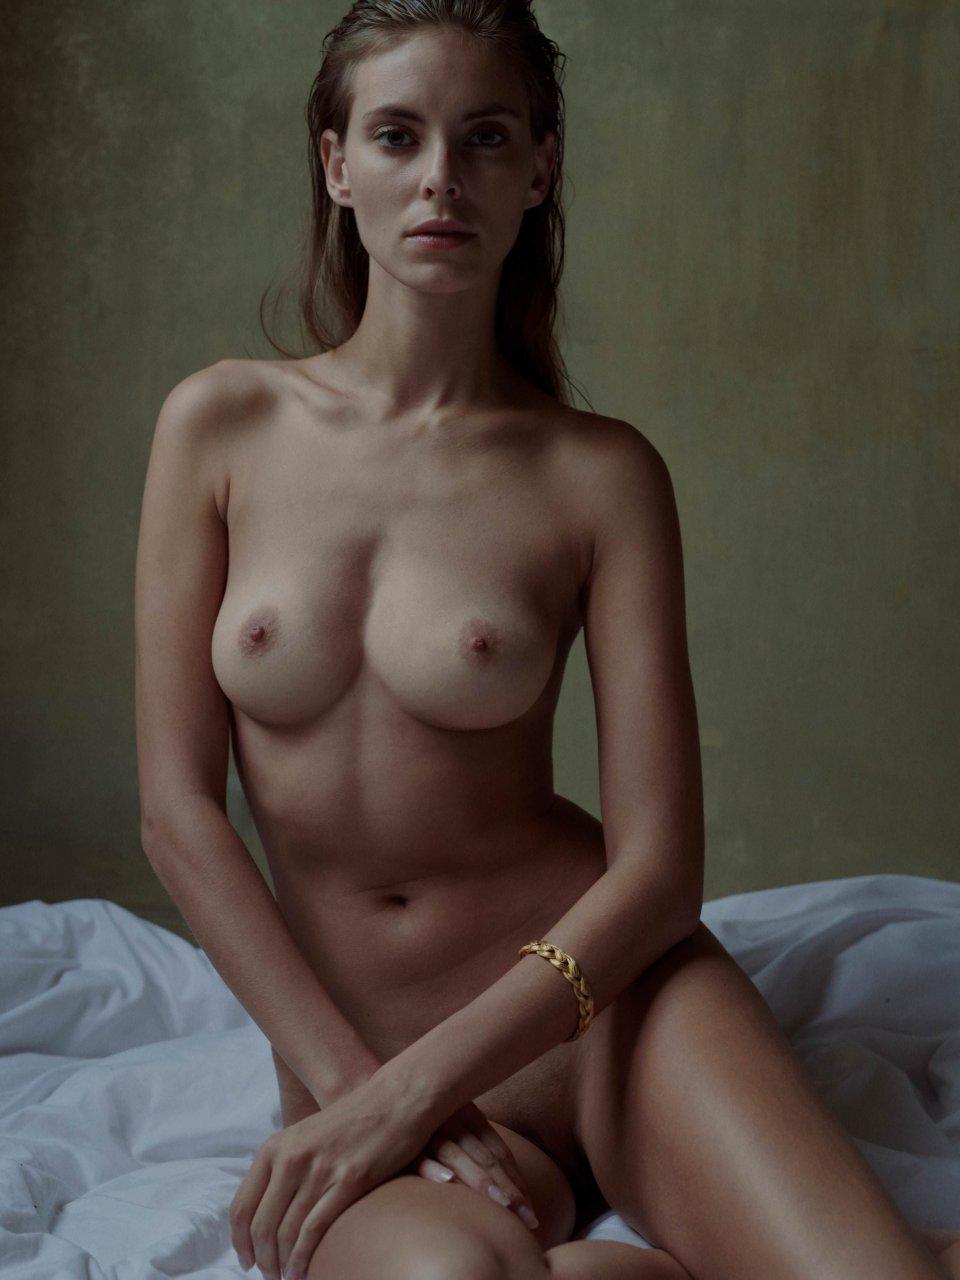 Joyce Verheyen Nude - 9 Photos nudes (18 photo), Cleavage Celebrity images